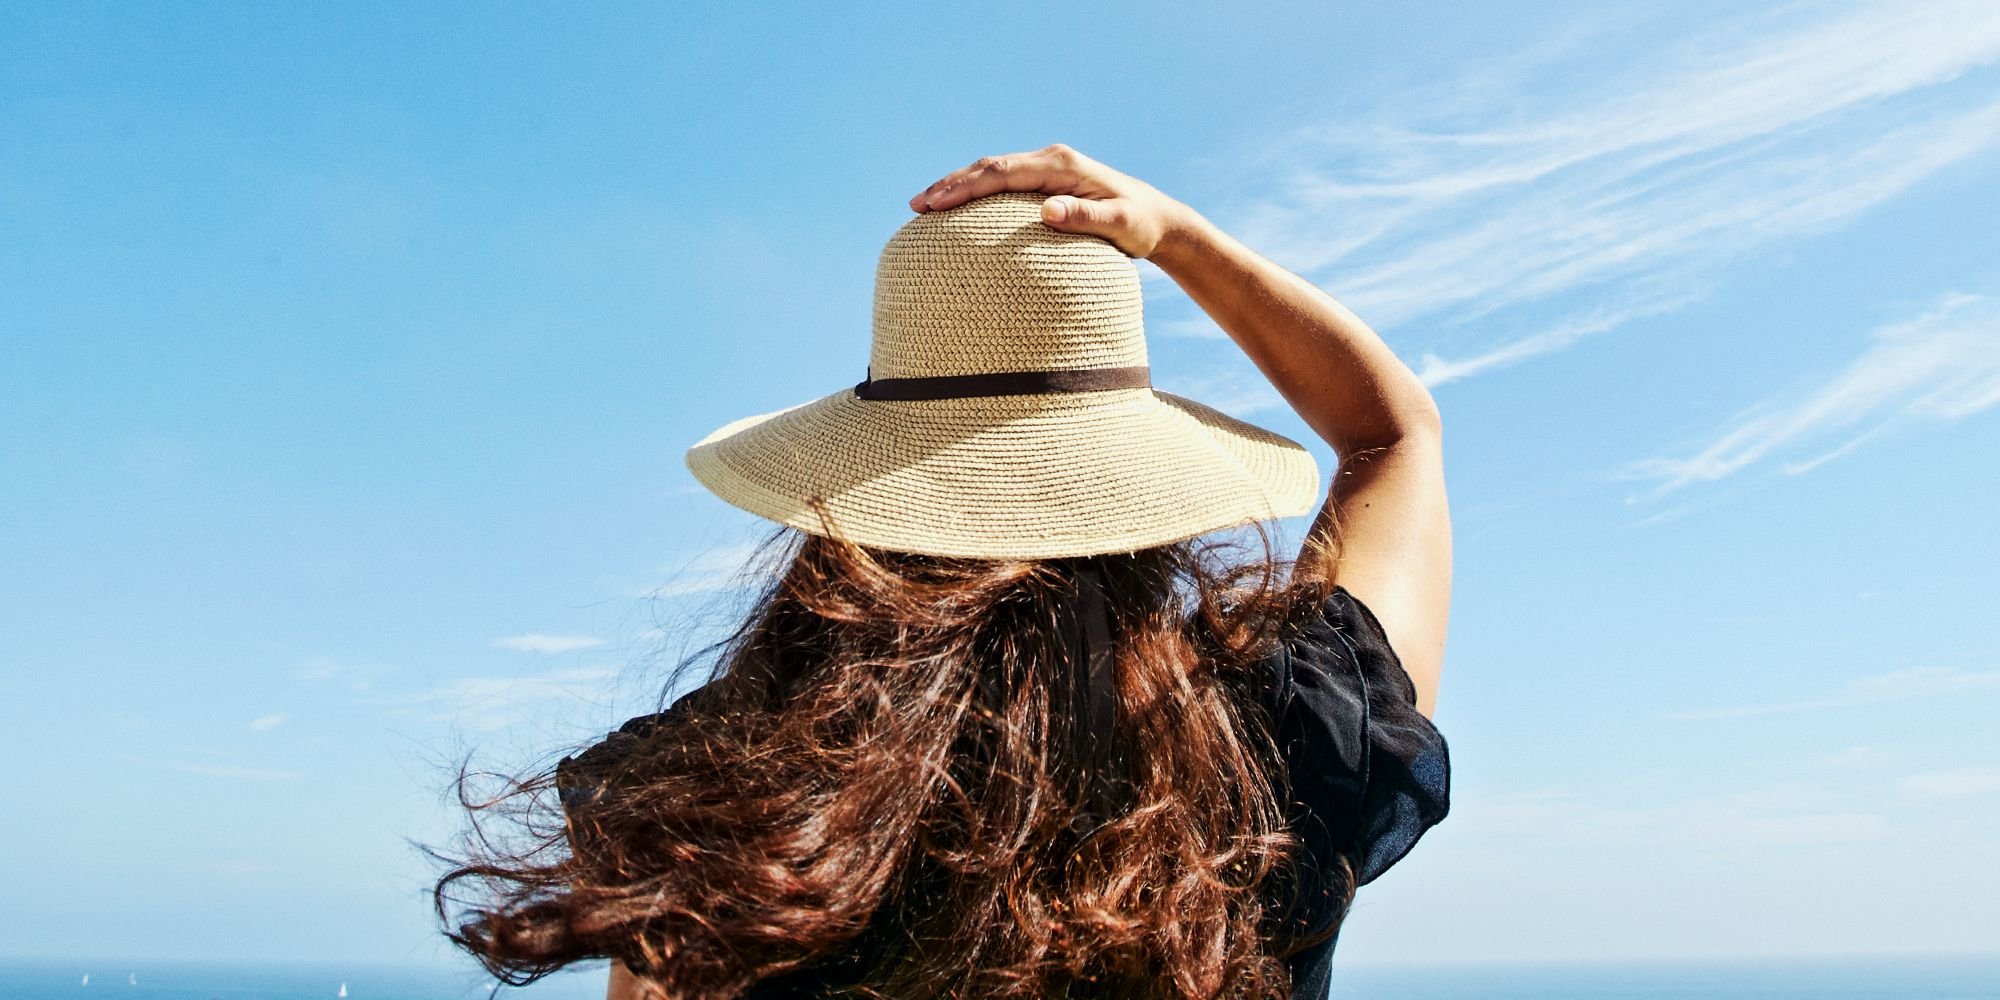 10 Cute Sun Hats for Women in 2018 - Straw Beach Hats for Summer 20031e74860